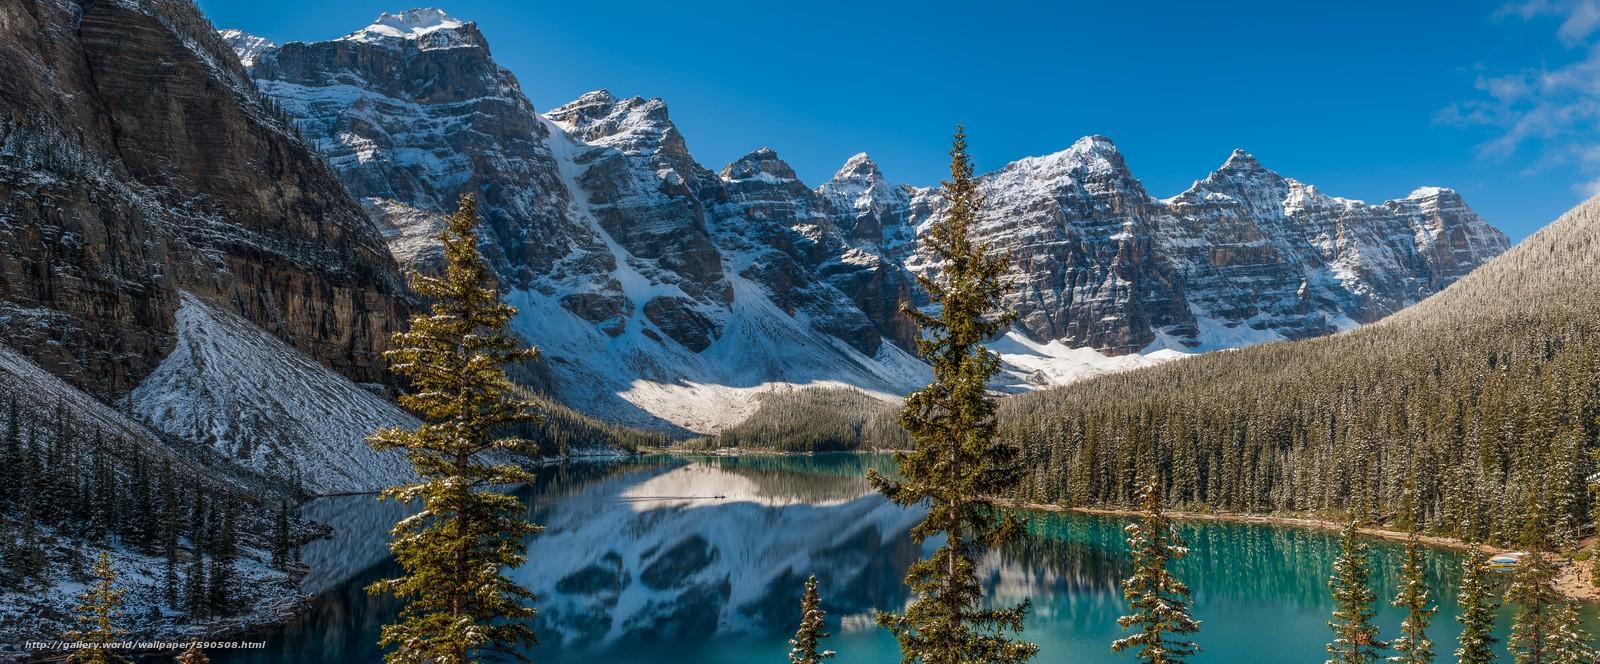 Moraine Lake Wallpaper Canada World (124 Wallpapers)